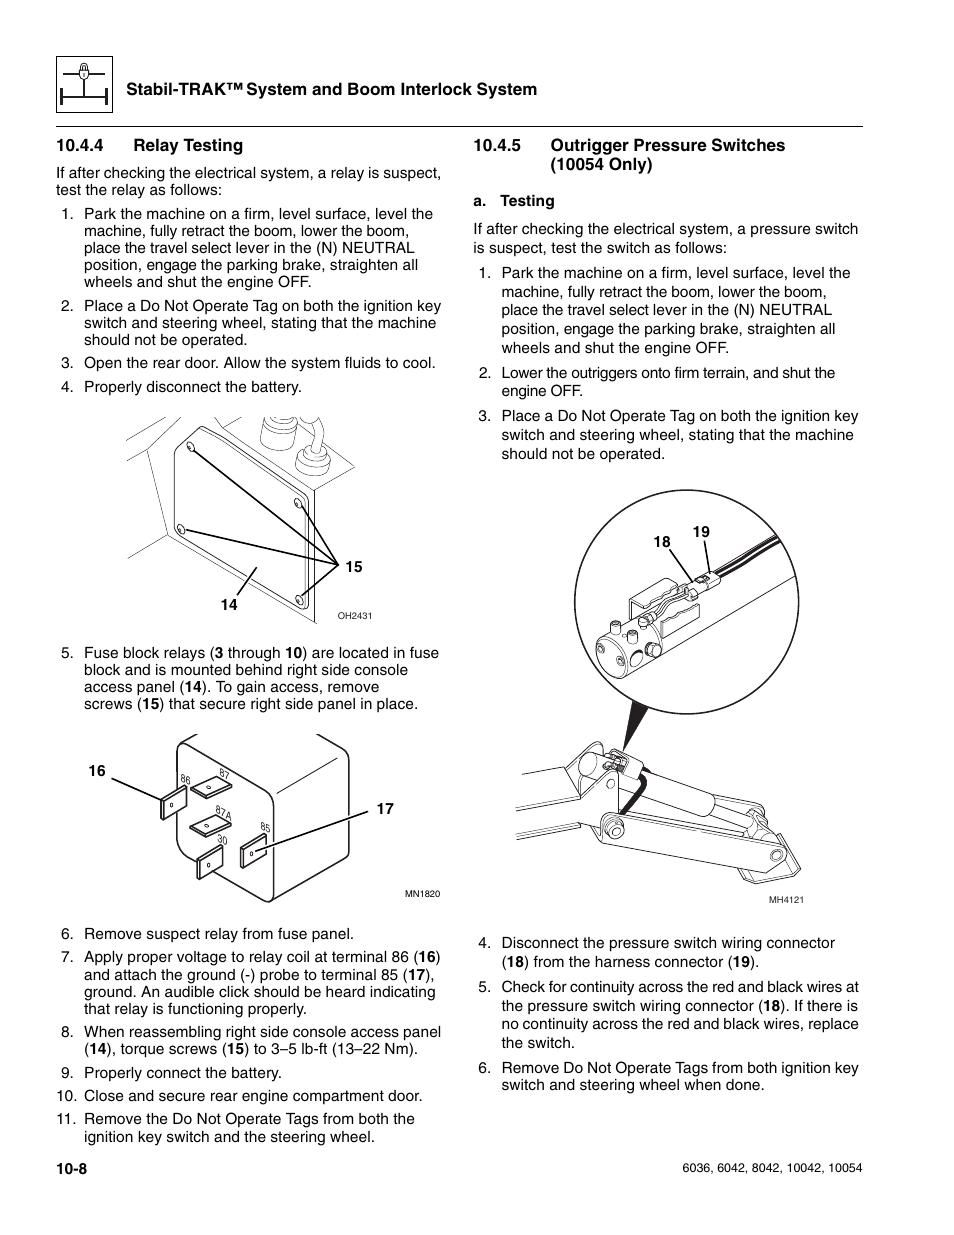 1950 Square D Pressure Switch 9013 Type A Diagram Trusted Wiring Pumptrol Skytrak Operators Manual